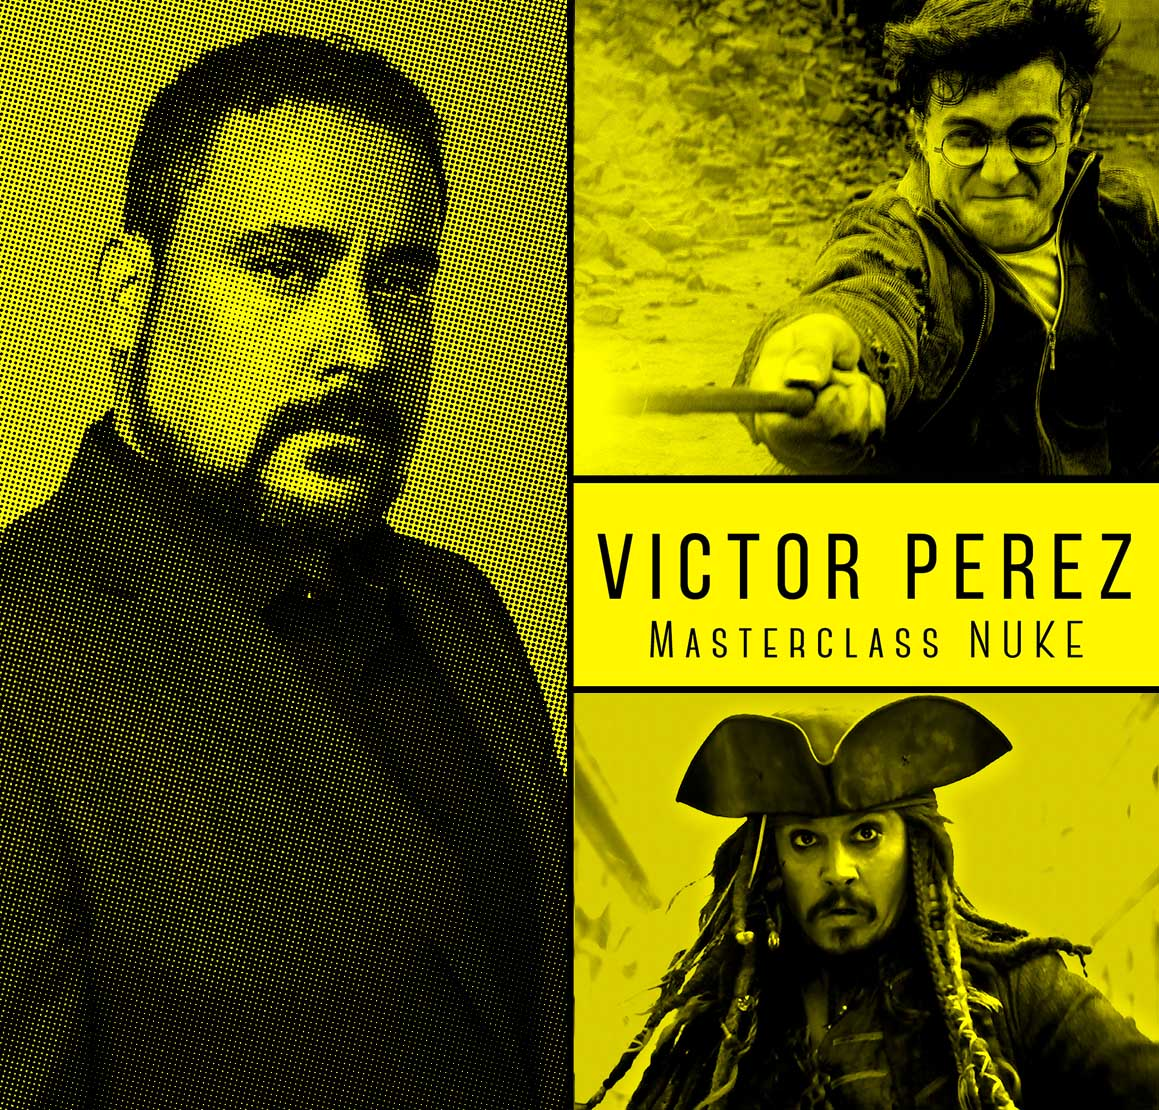 Masterclass_Nuke_Victor_Perez